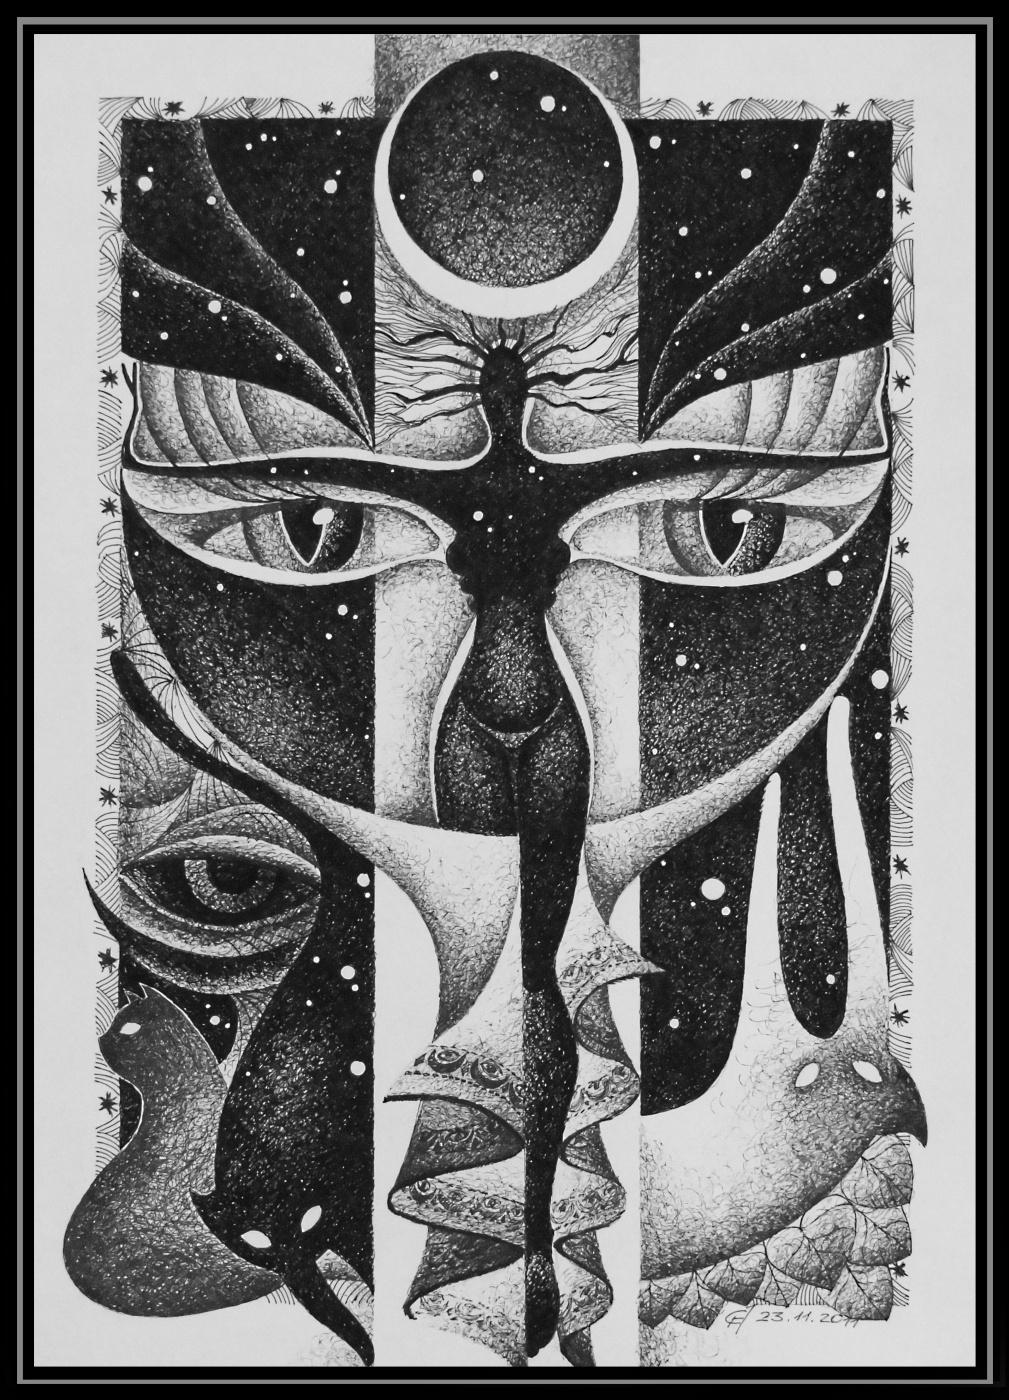 Georgy Stepanov. Abduction moon